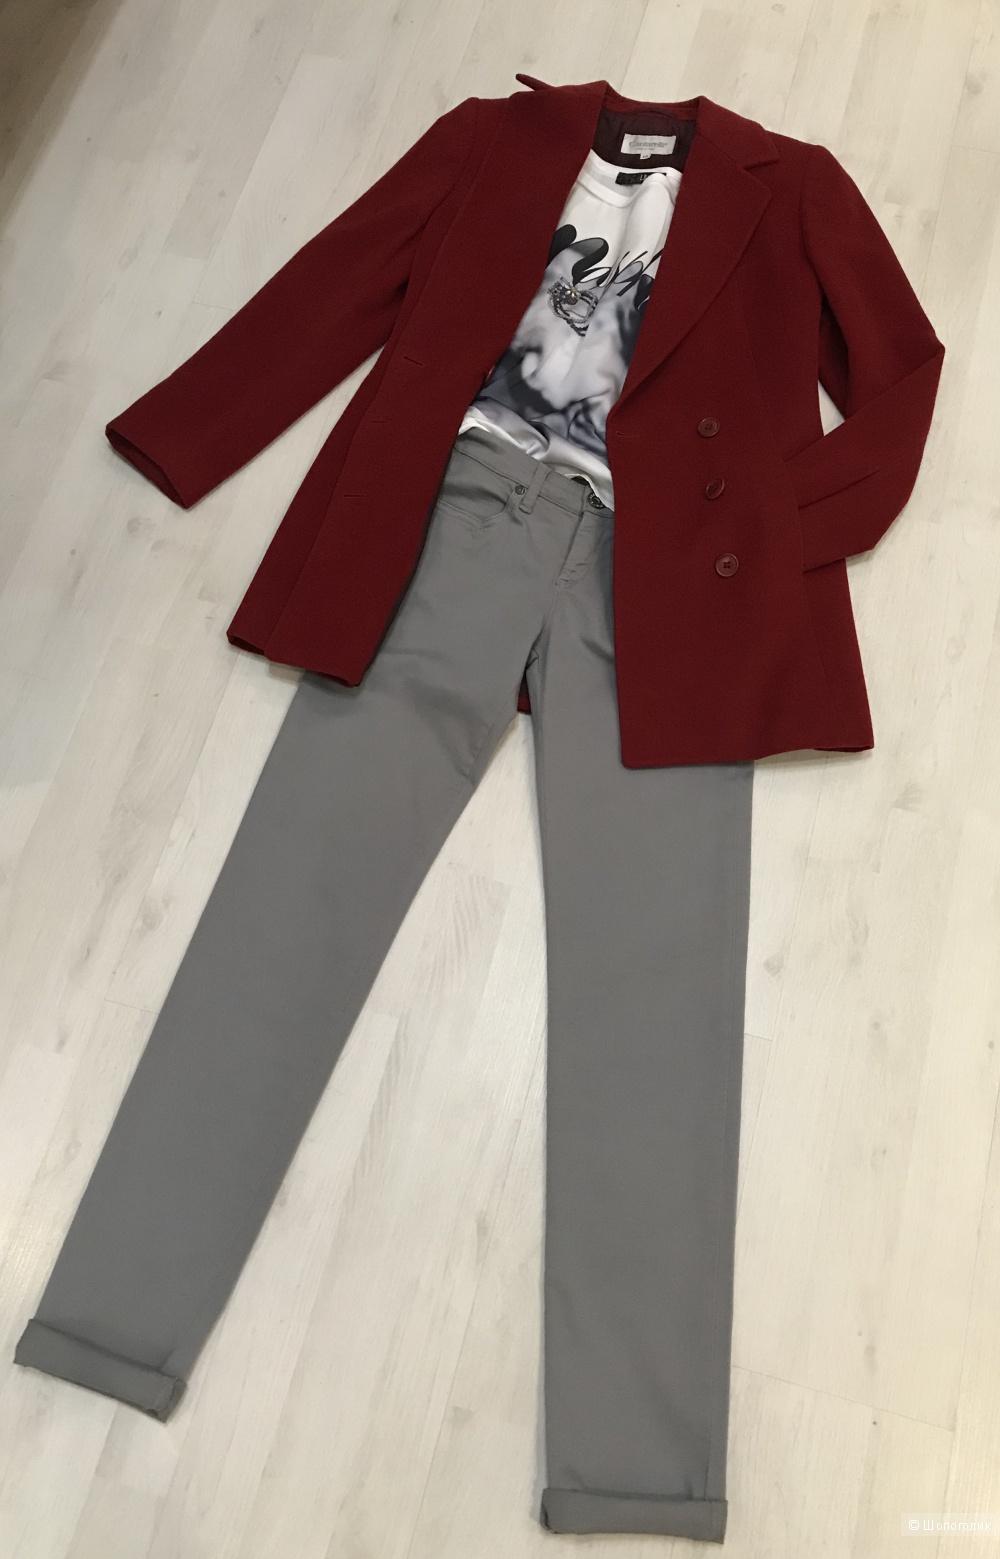 Пальто Cantarelli,  футболка Liu Jo, джинсы Sisley. размер 42